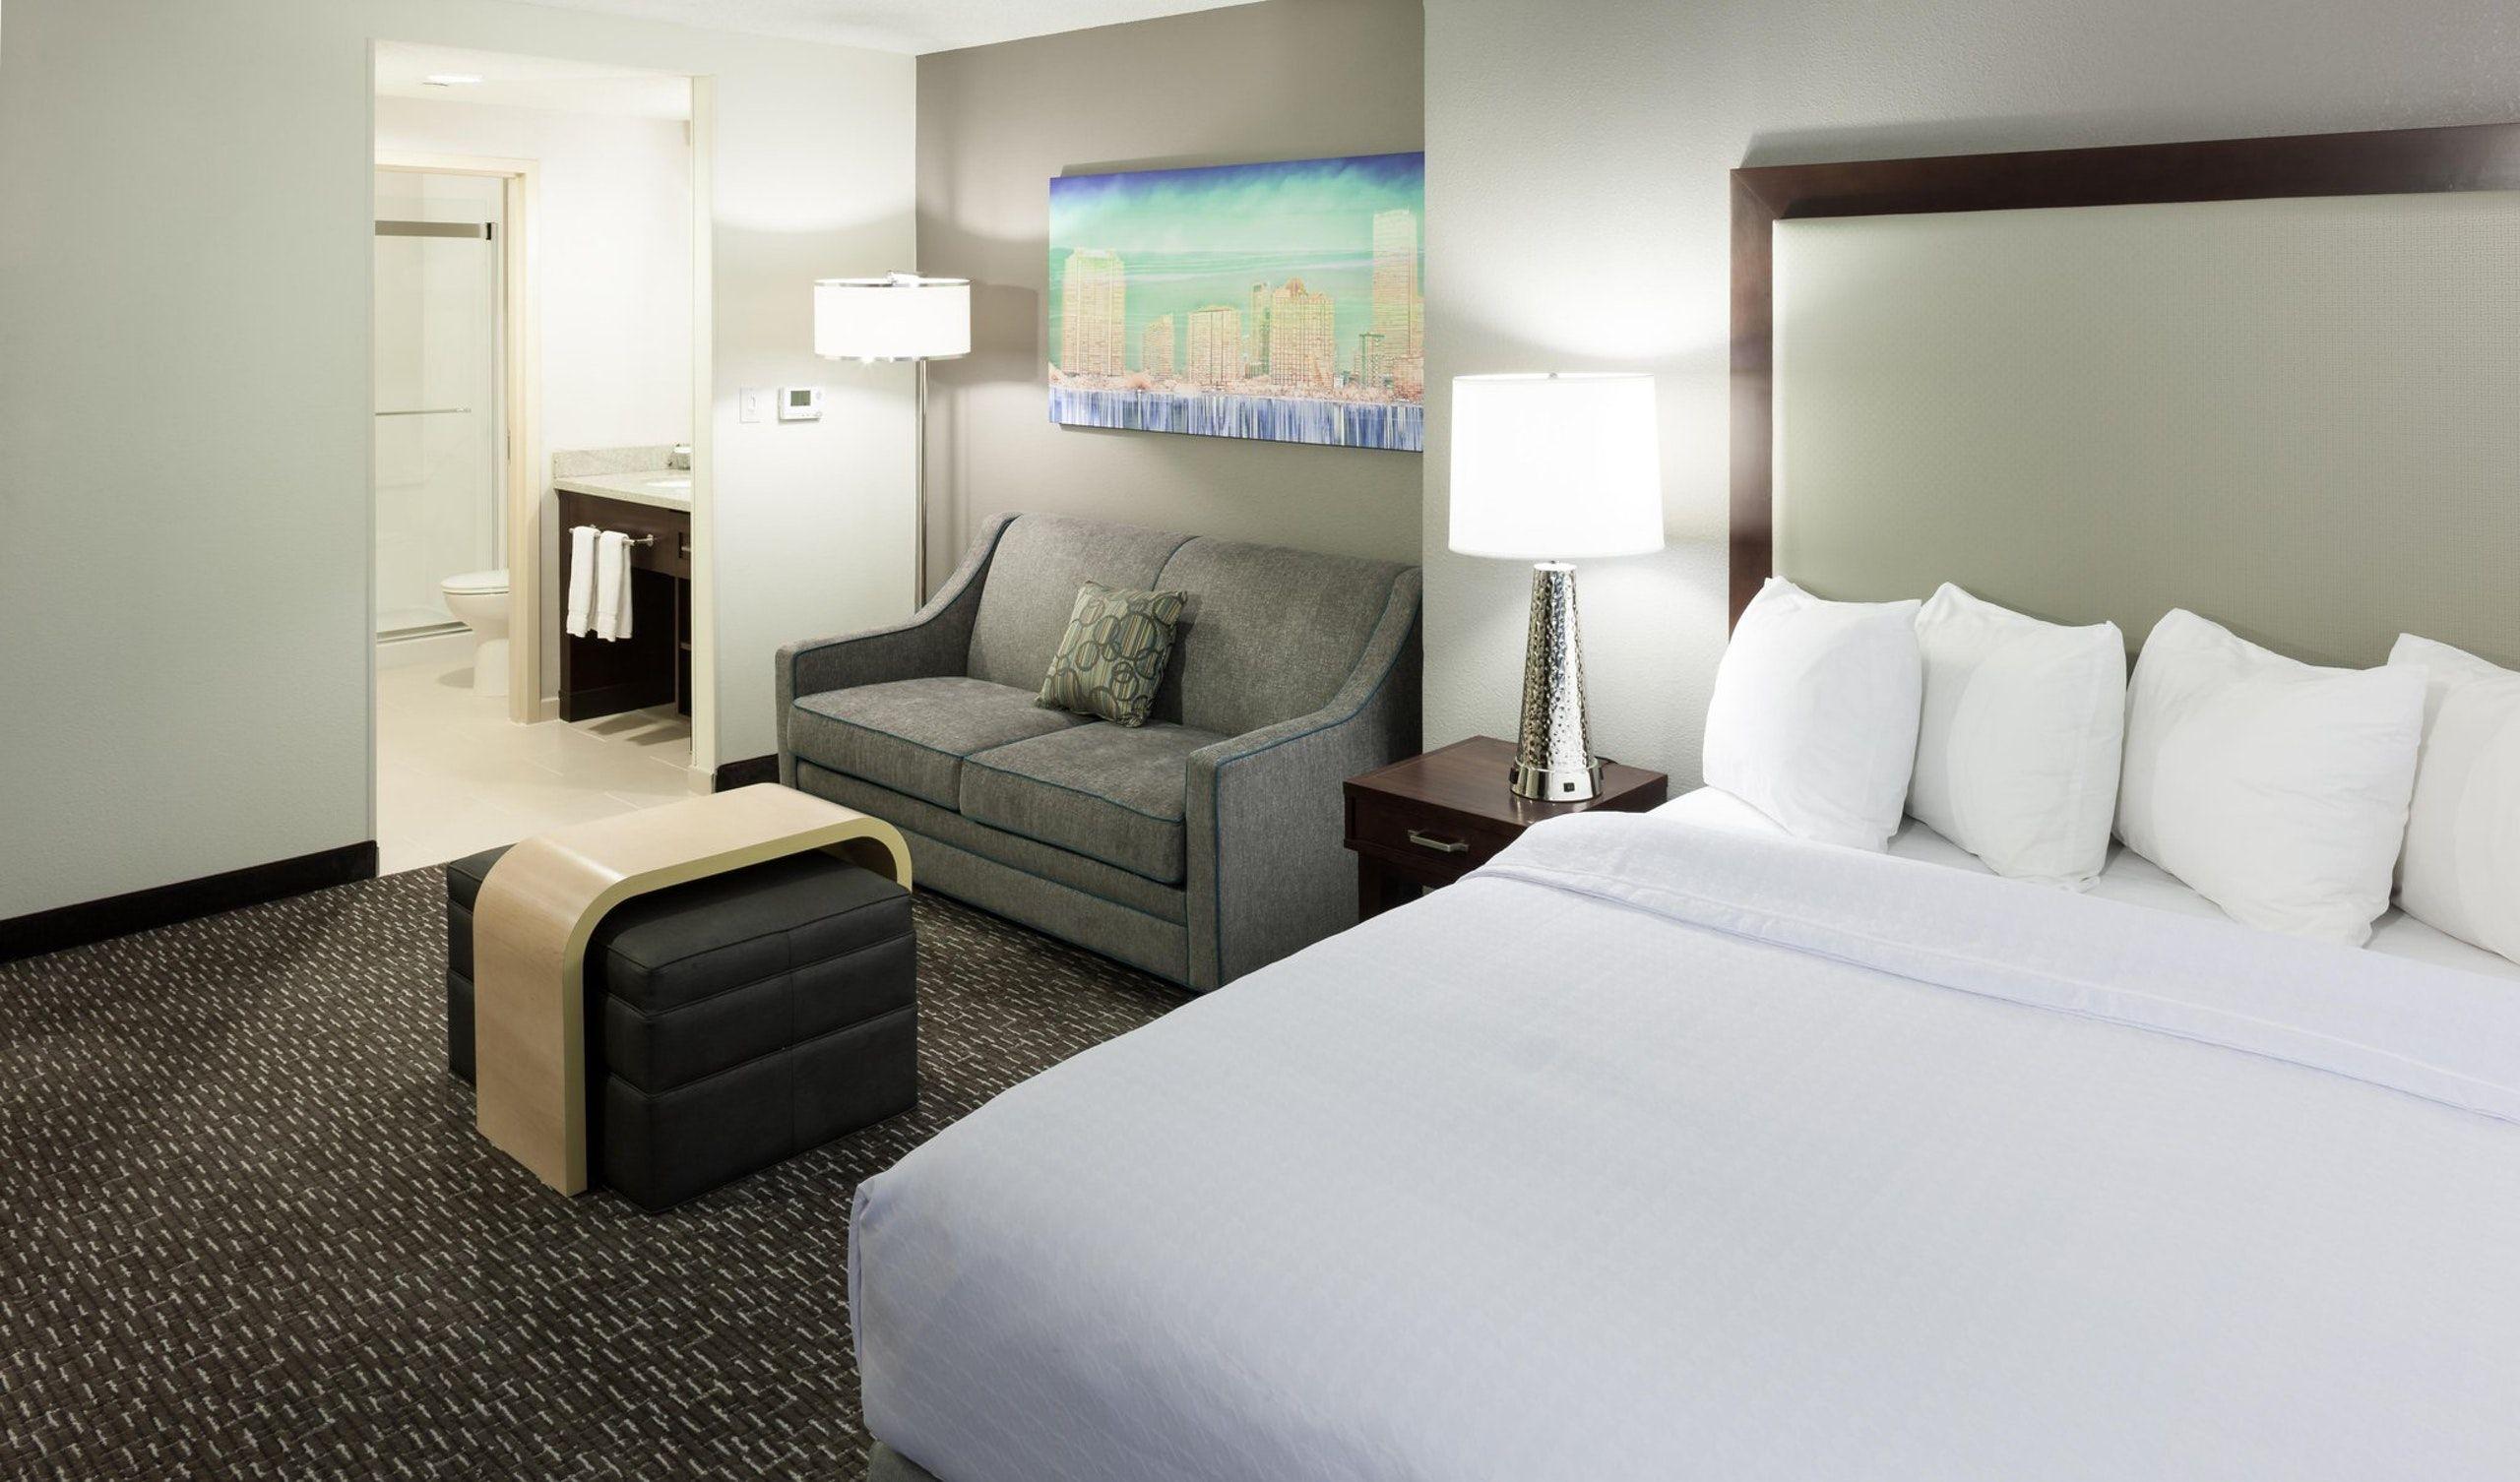 Suites At Homewood Suites by Hilton MiamiAirport/Blue